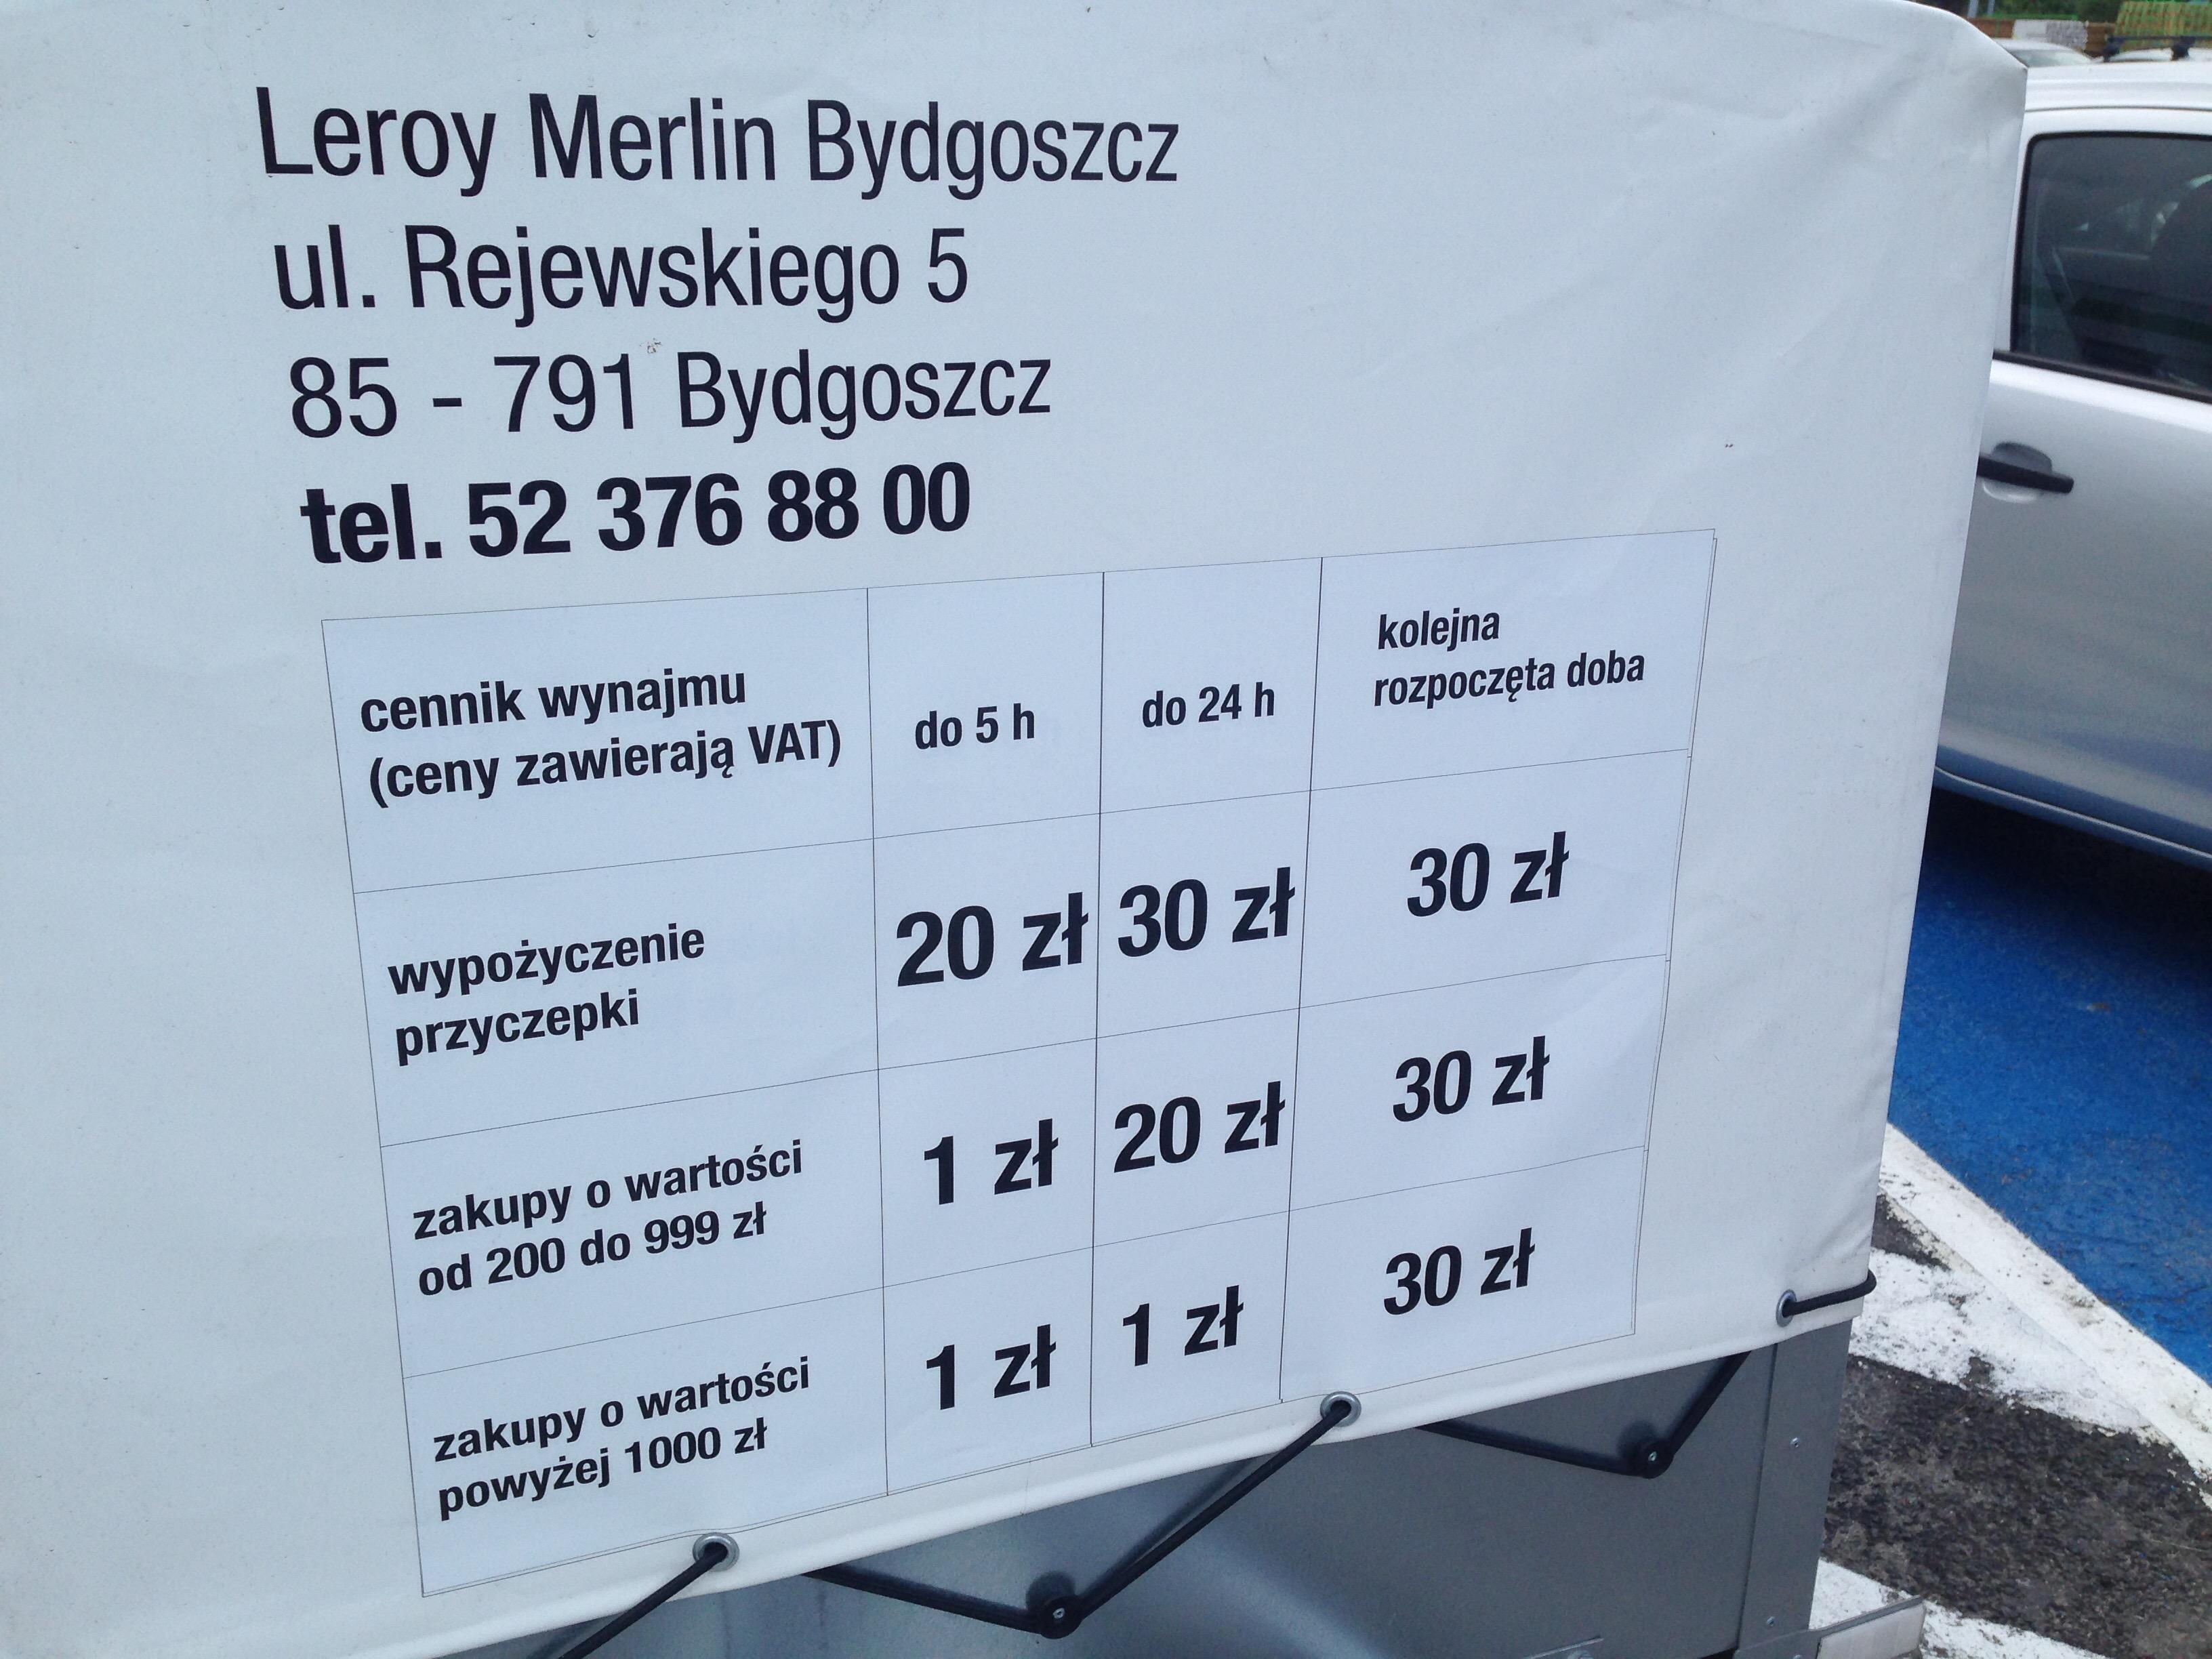 Tel leroy merlin. finest tel leroy merlin with tel leroy merlin